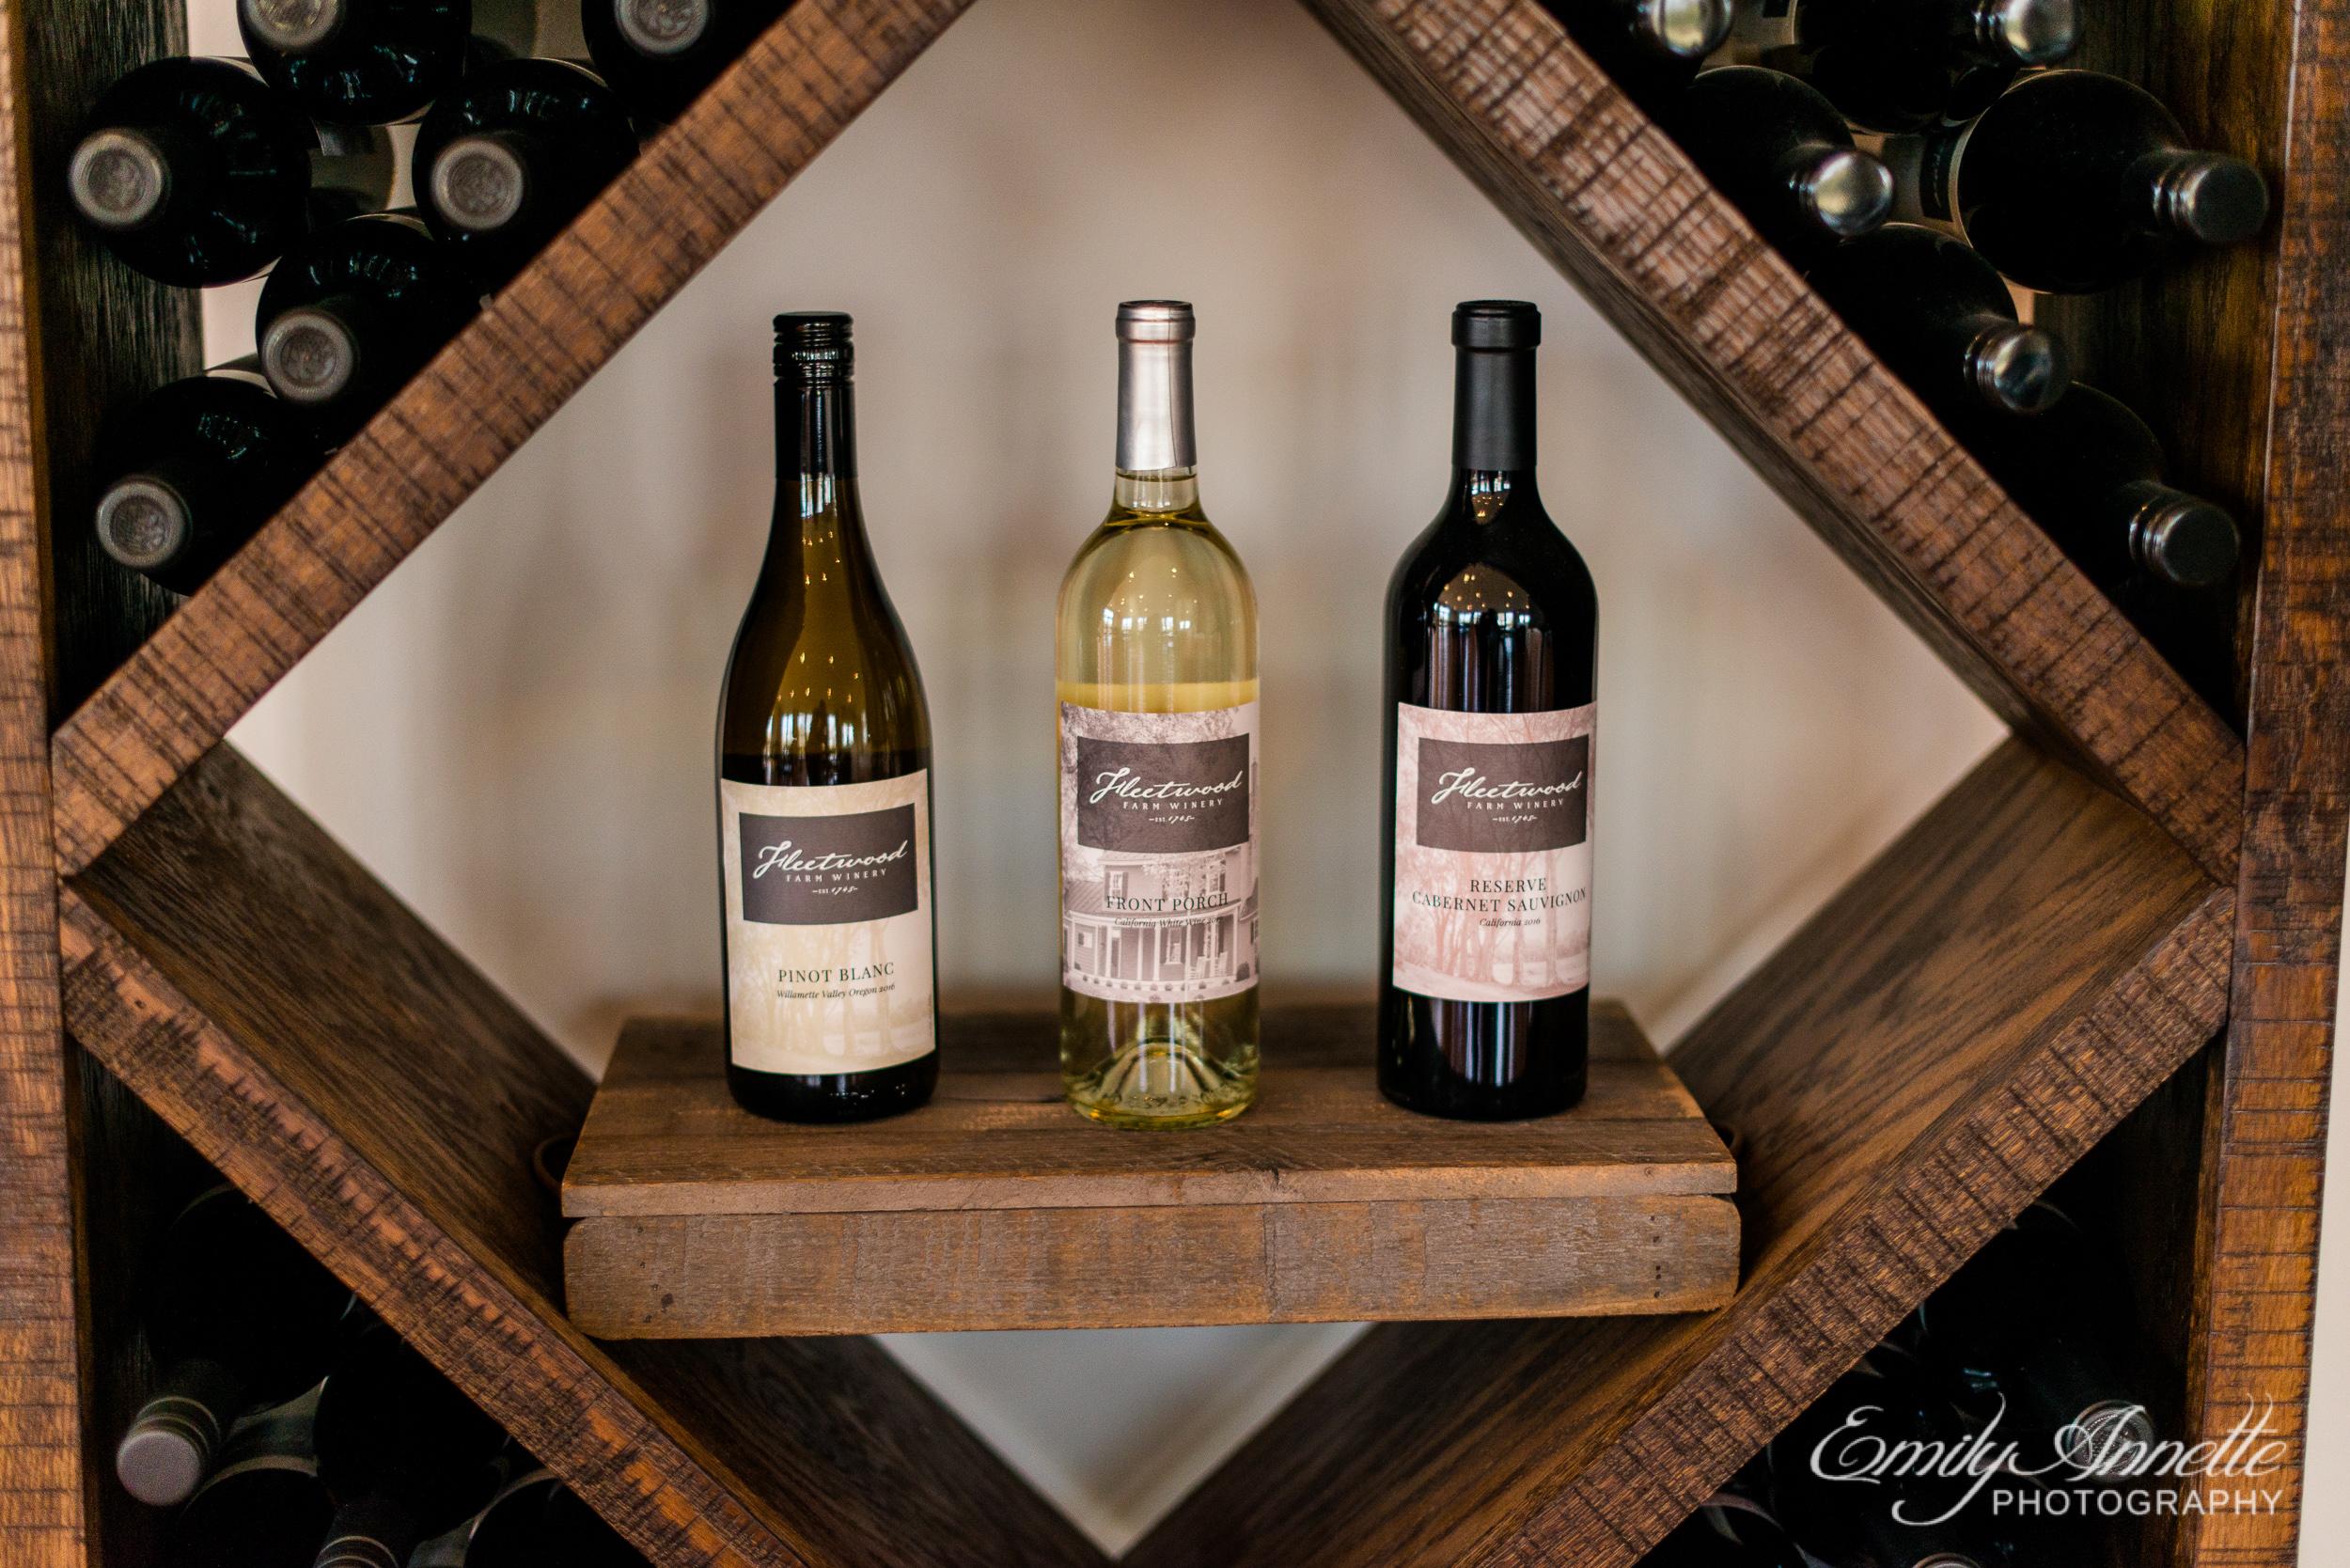 Details of wine bottles displayed at a wedding at Fleetwood Farm Winery in Leesburg, Virginia